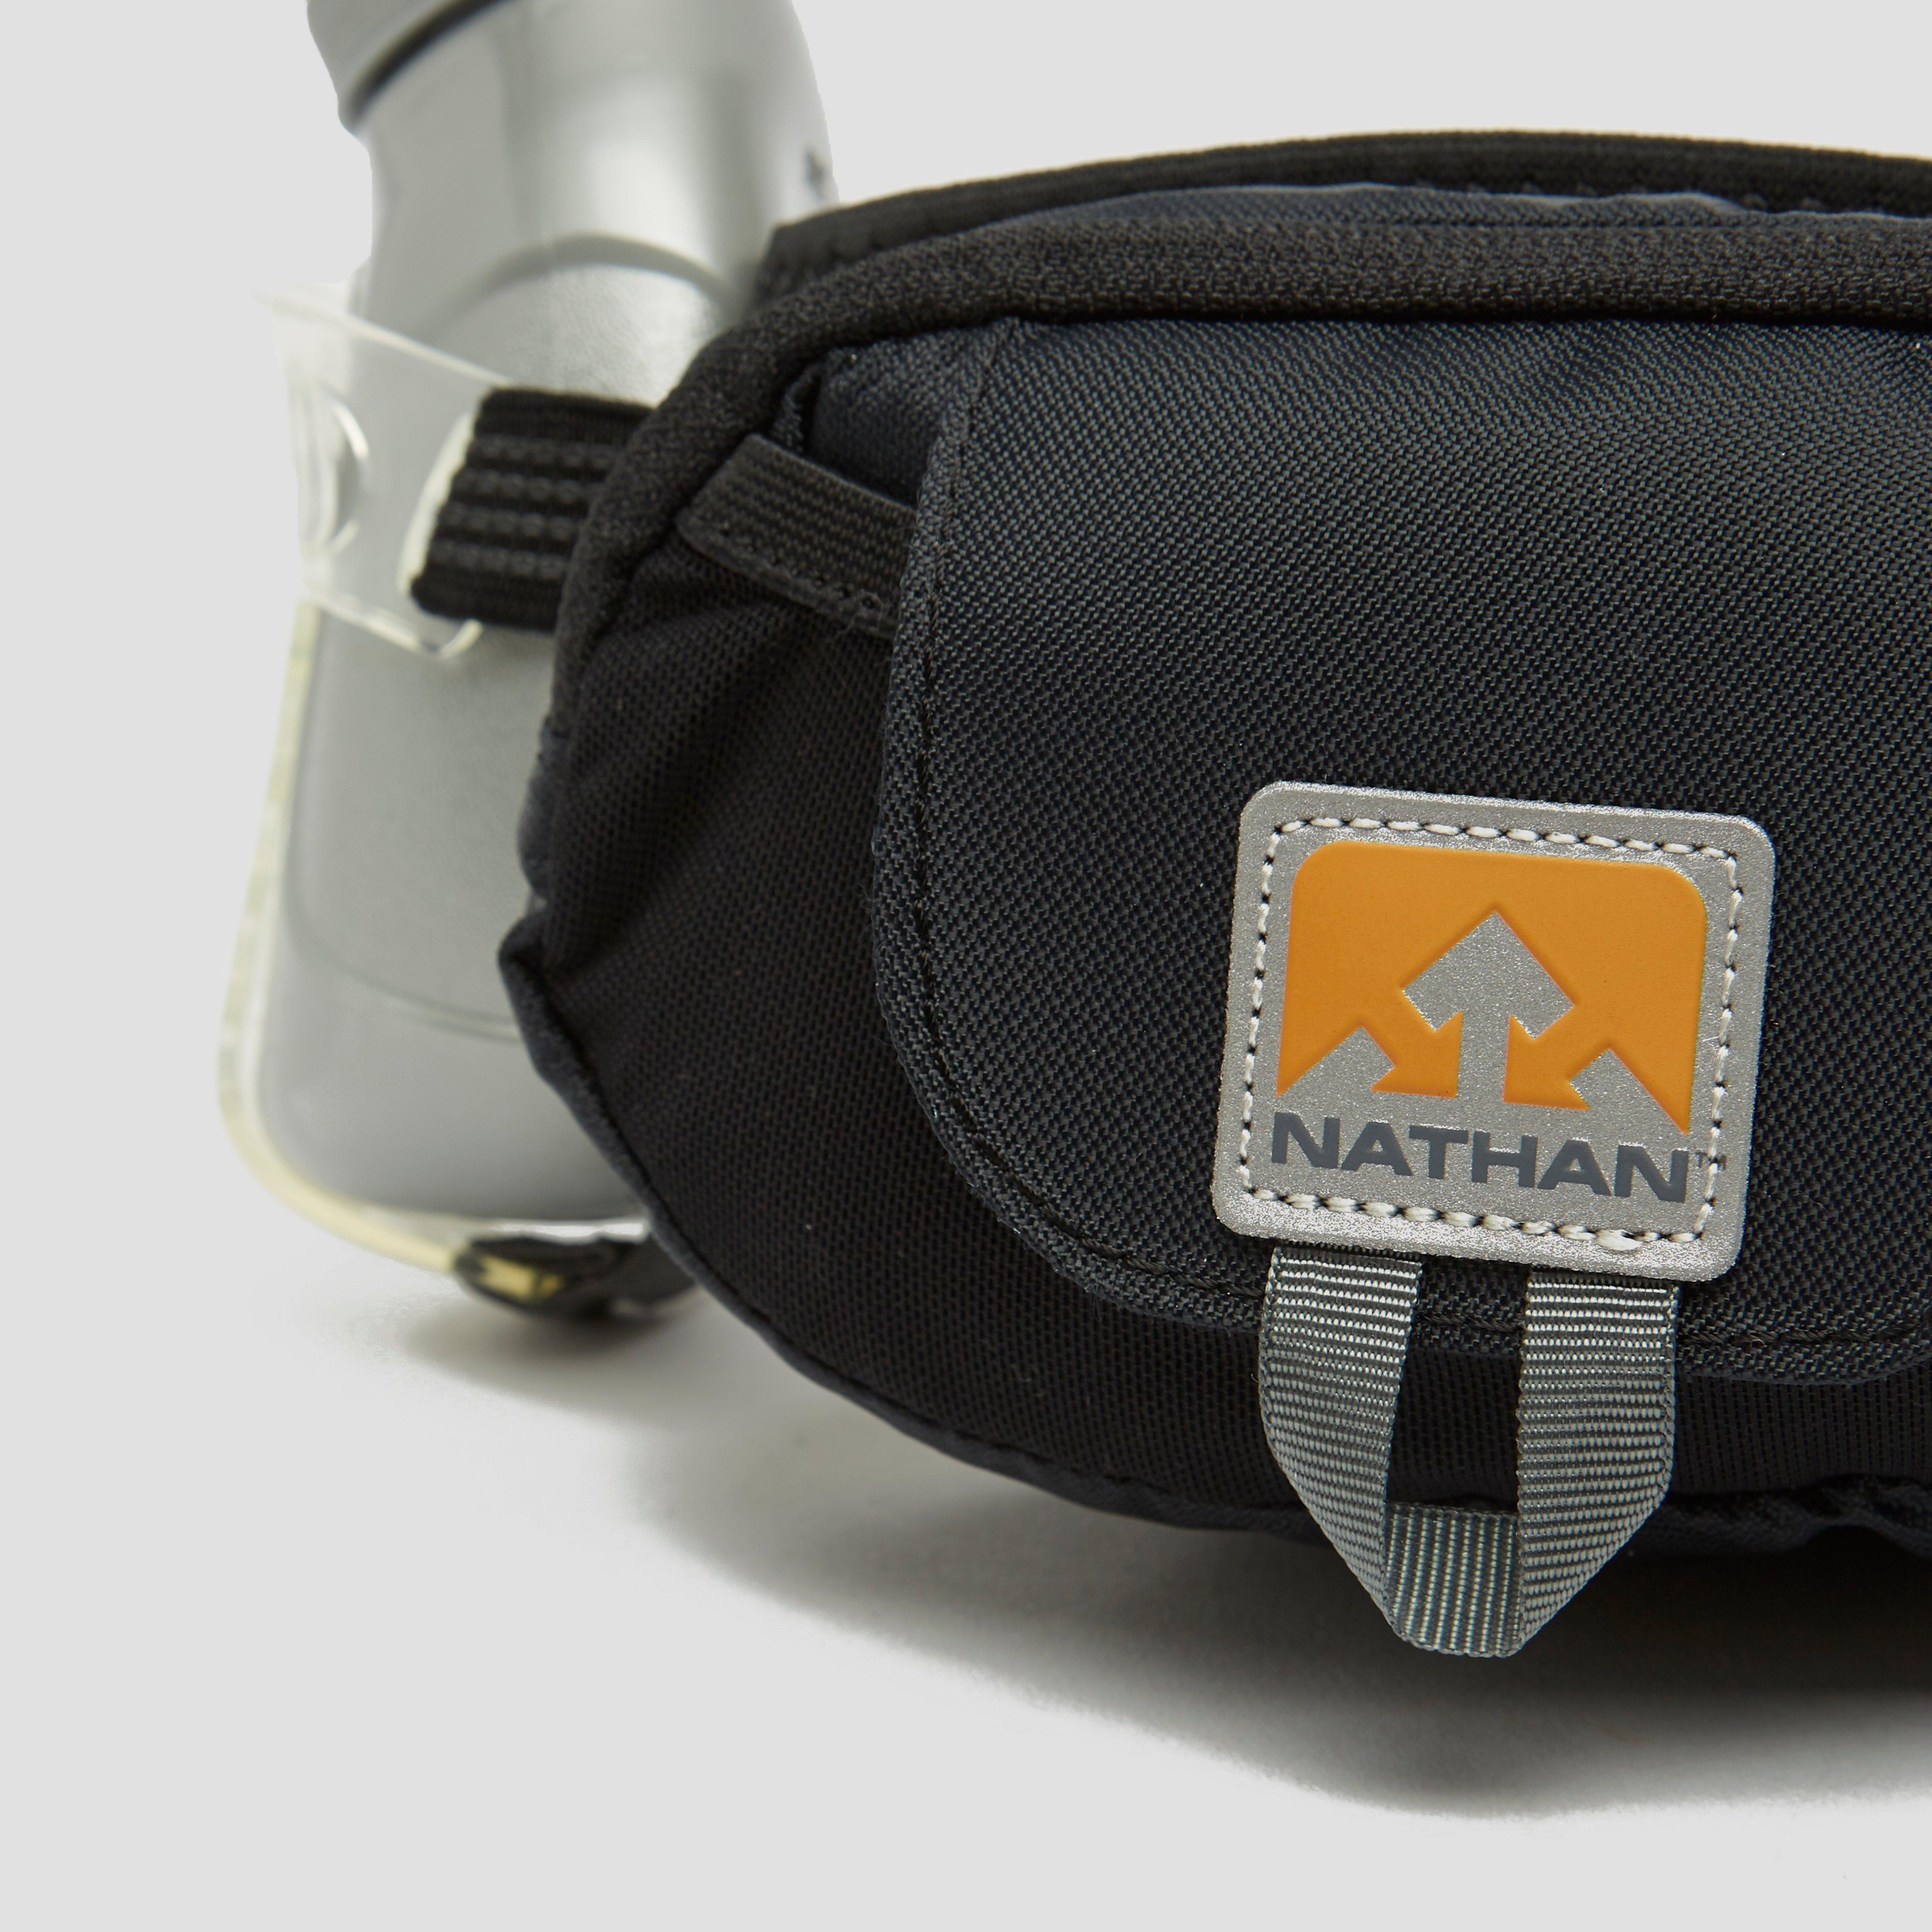 NATHAN TRAIL MIX HEUPTAS ZWART